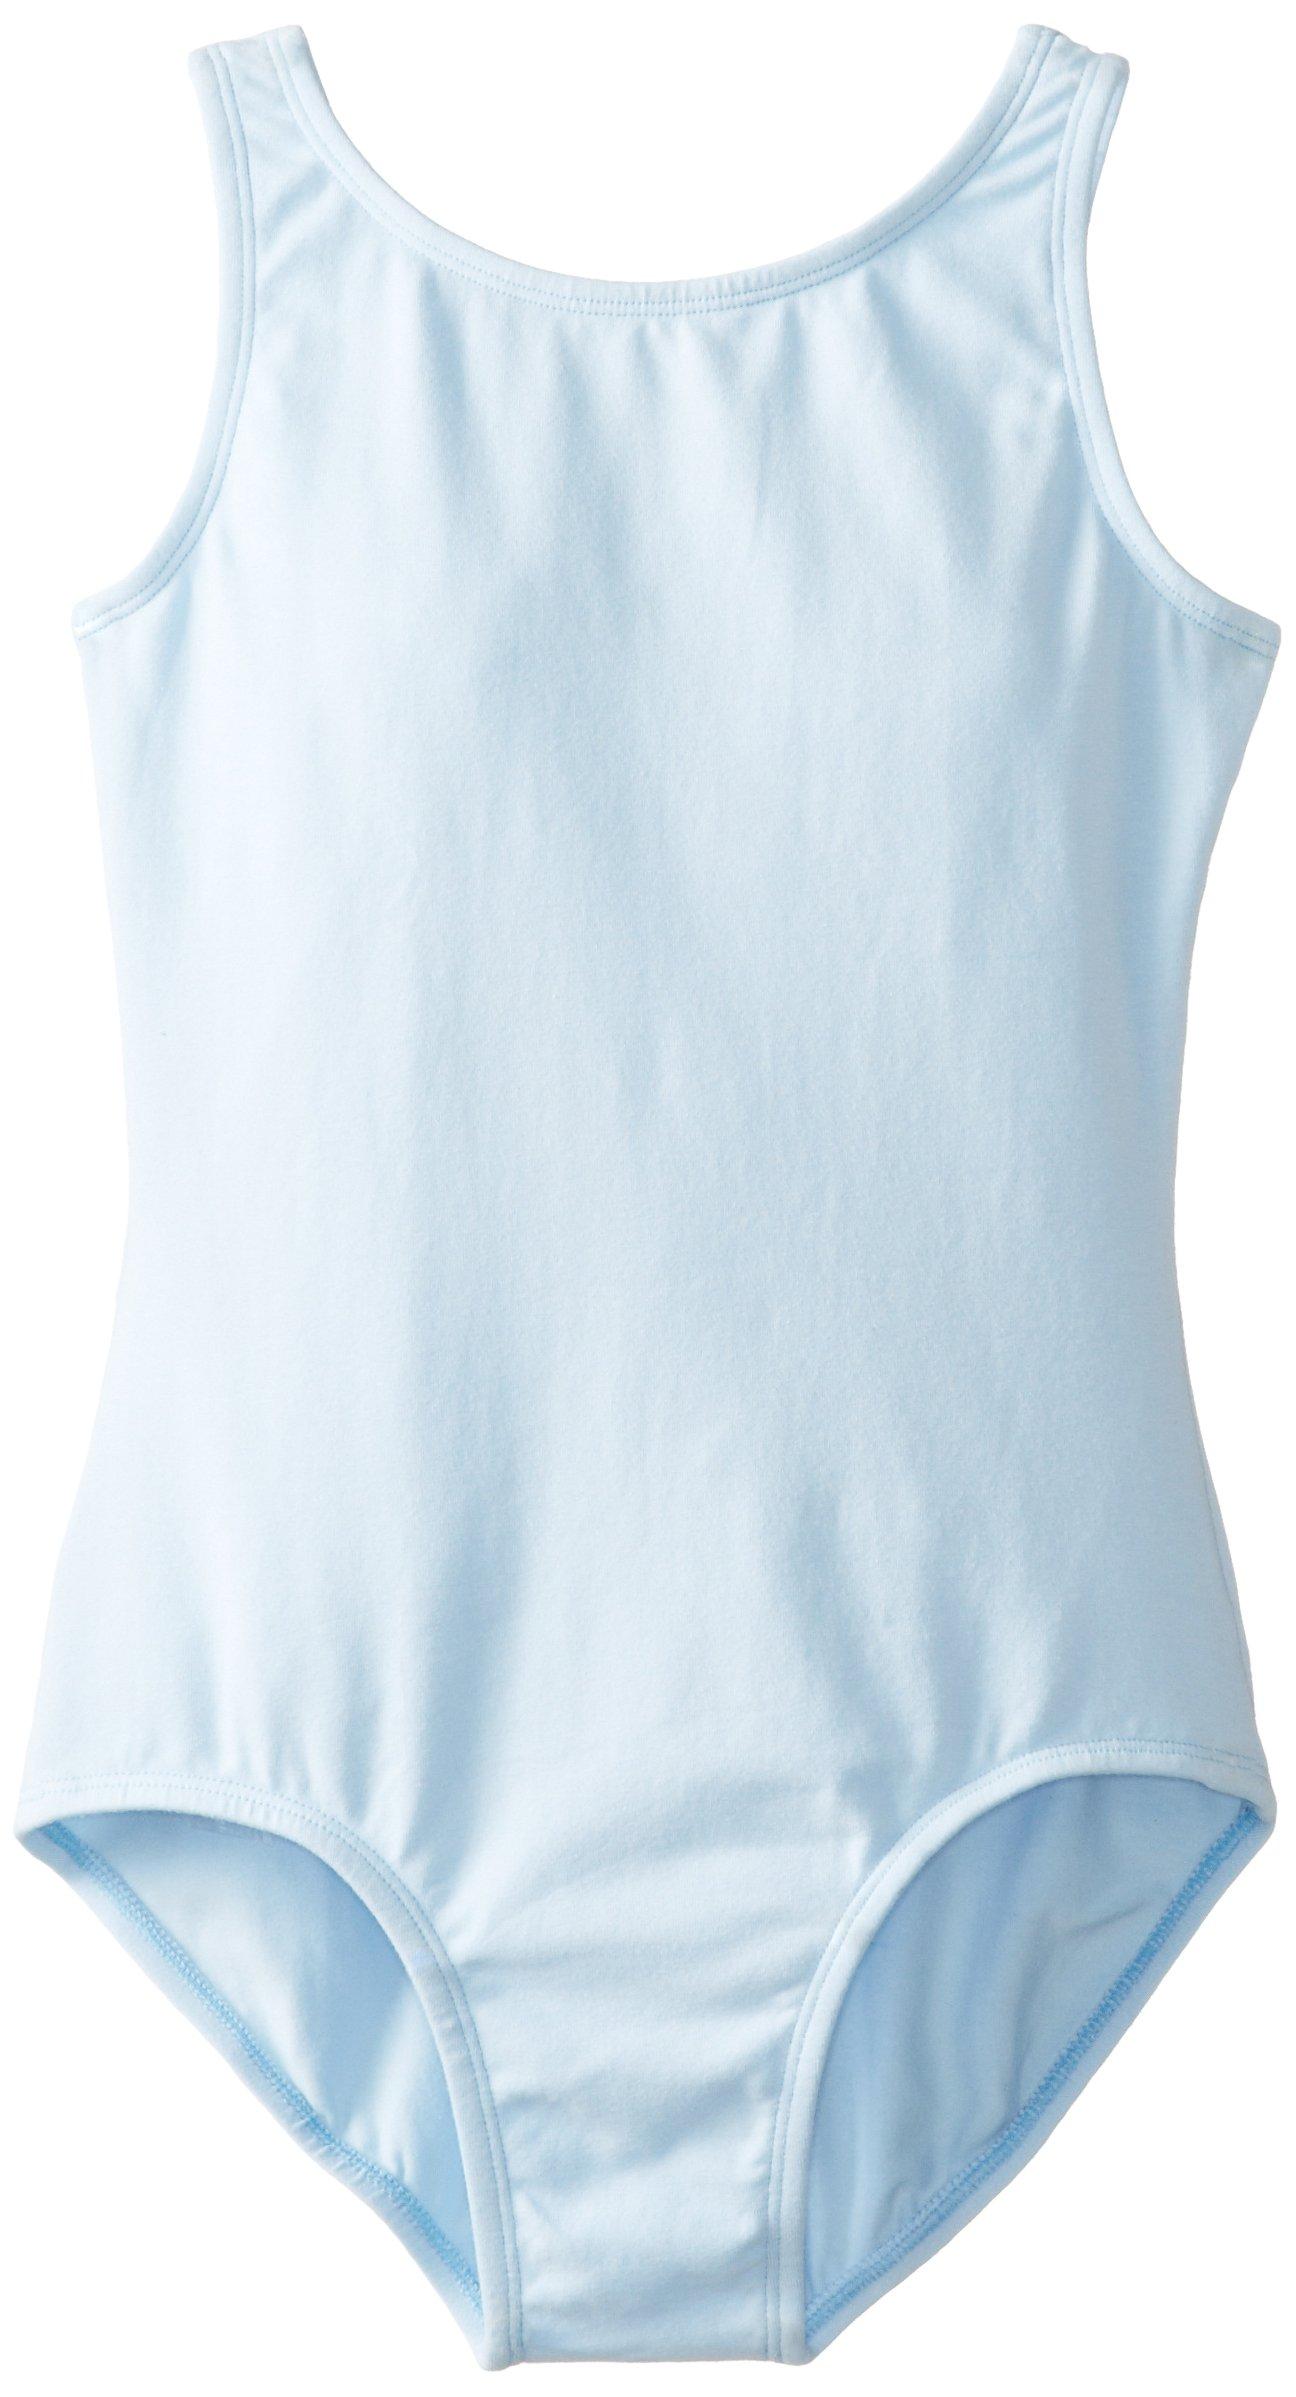 Little Girl's Leotard Ballet Cut Sleeveless Cami Tank One Piece Bodysuit Dancewear